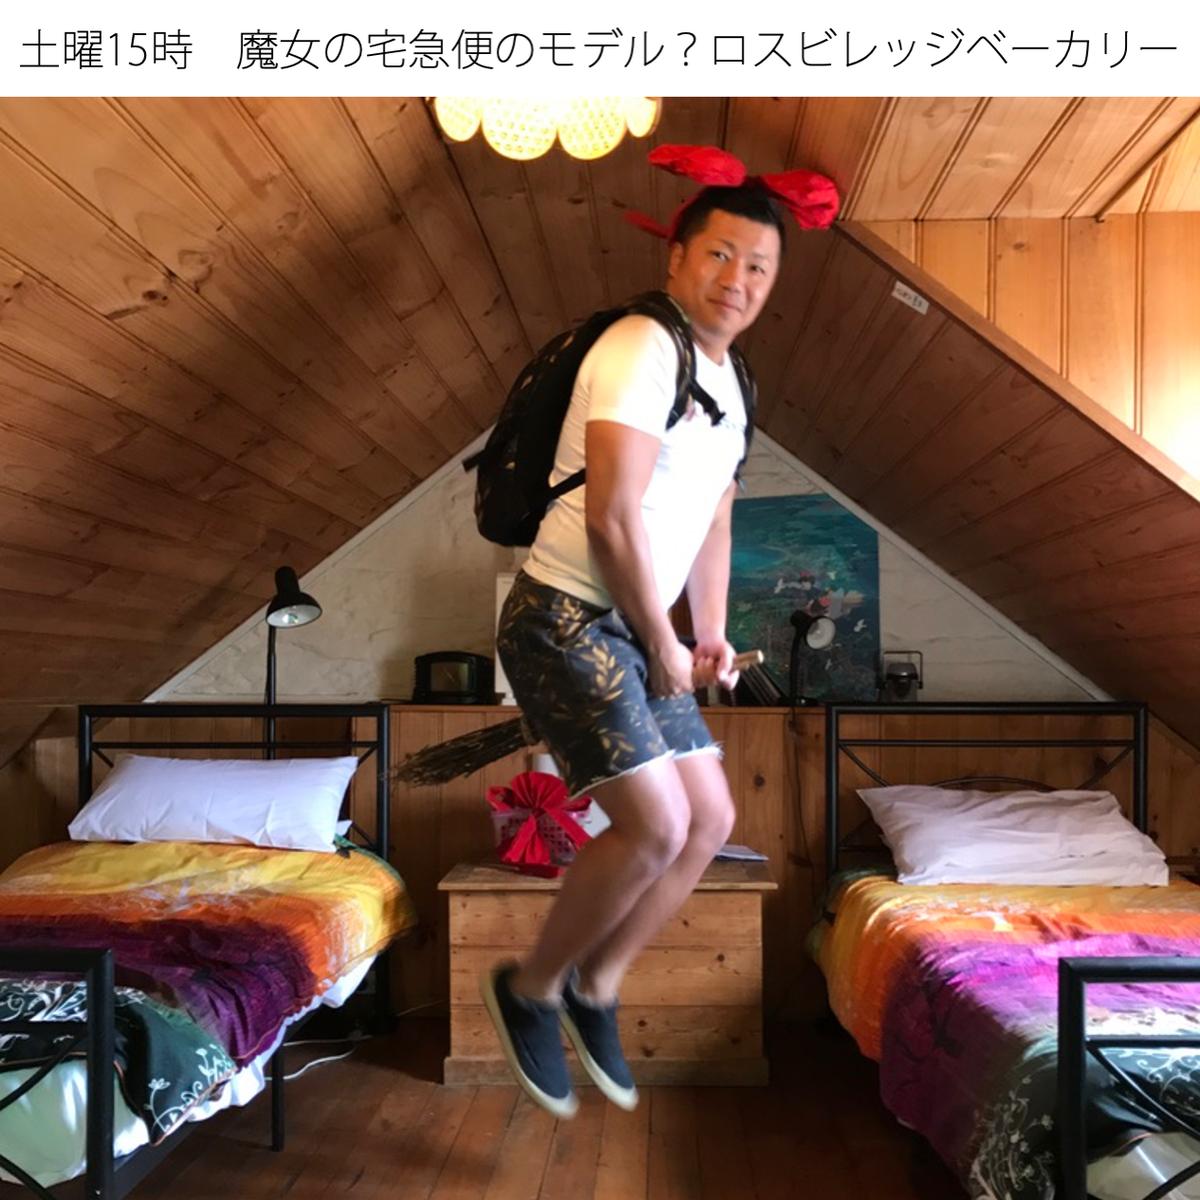 f:id:tomatsu1024:20210816180840p:plain